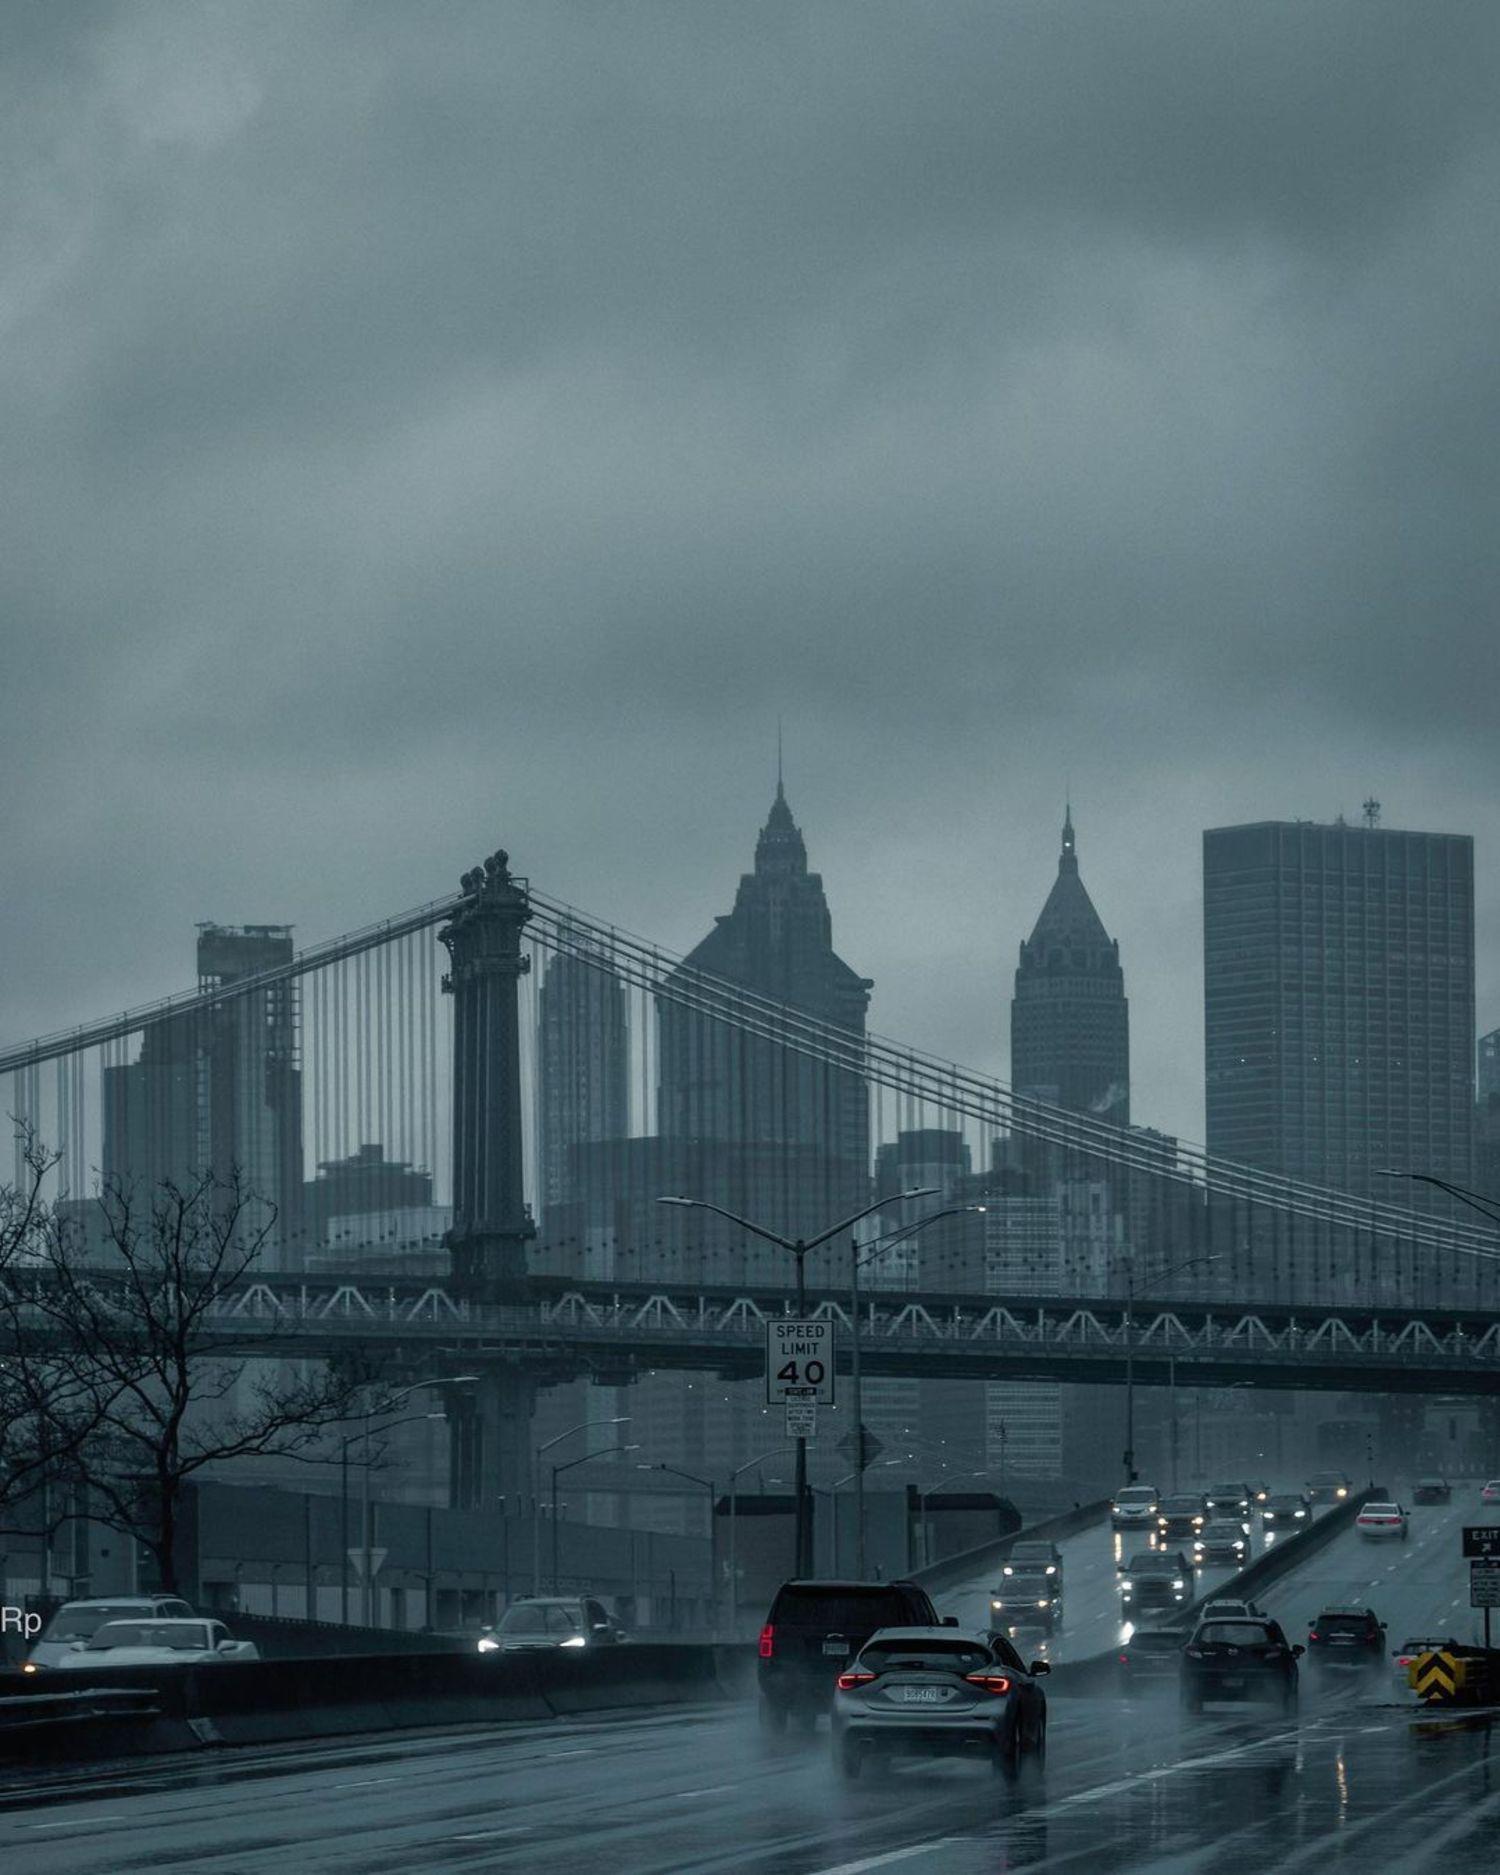 FDR Drive, Lower Manhattan